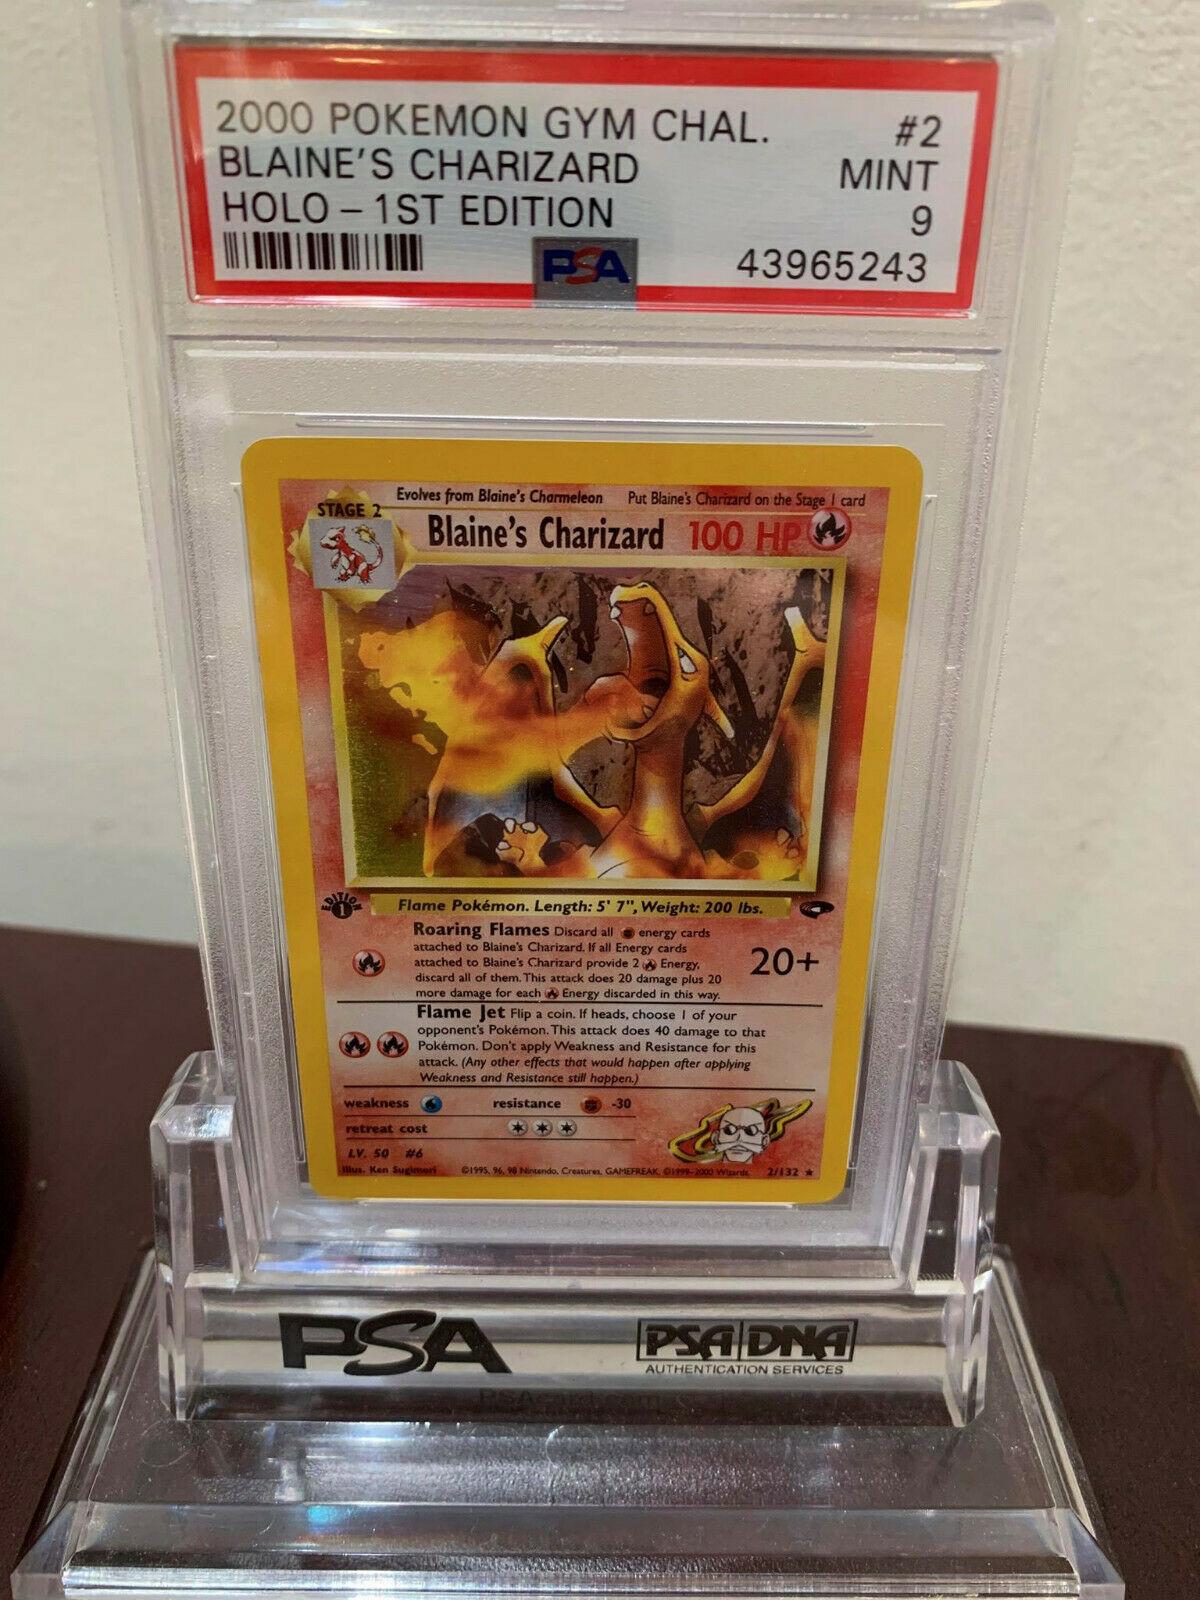 PSA 9 Holo 1st Edition Blaines Charizard Gym Challenge Pokemon Card 2132